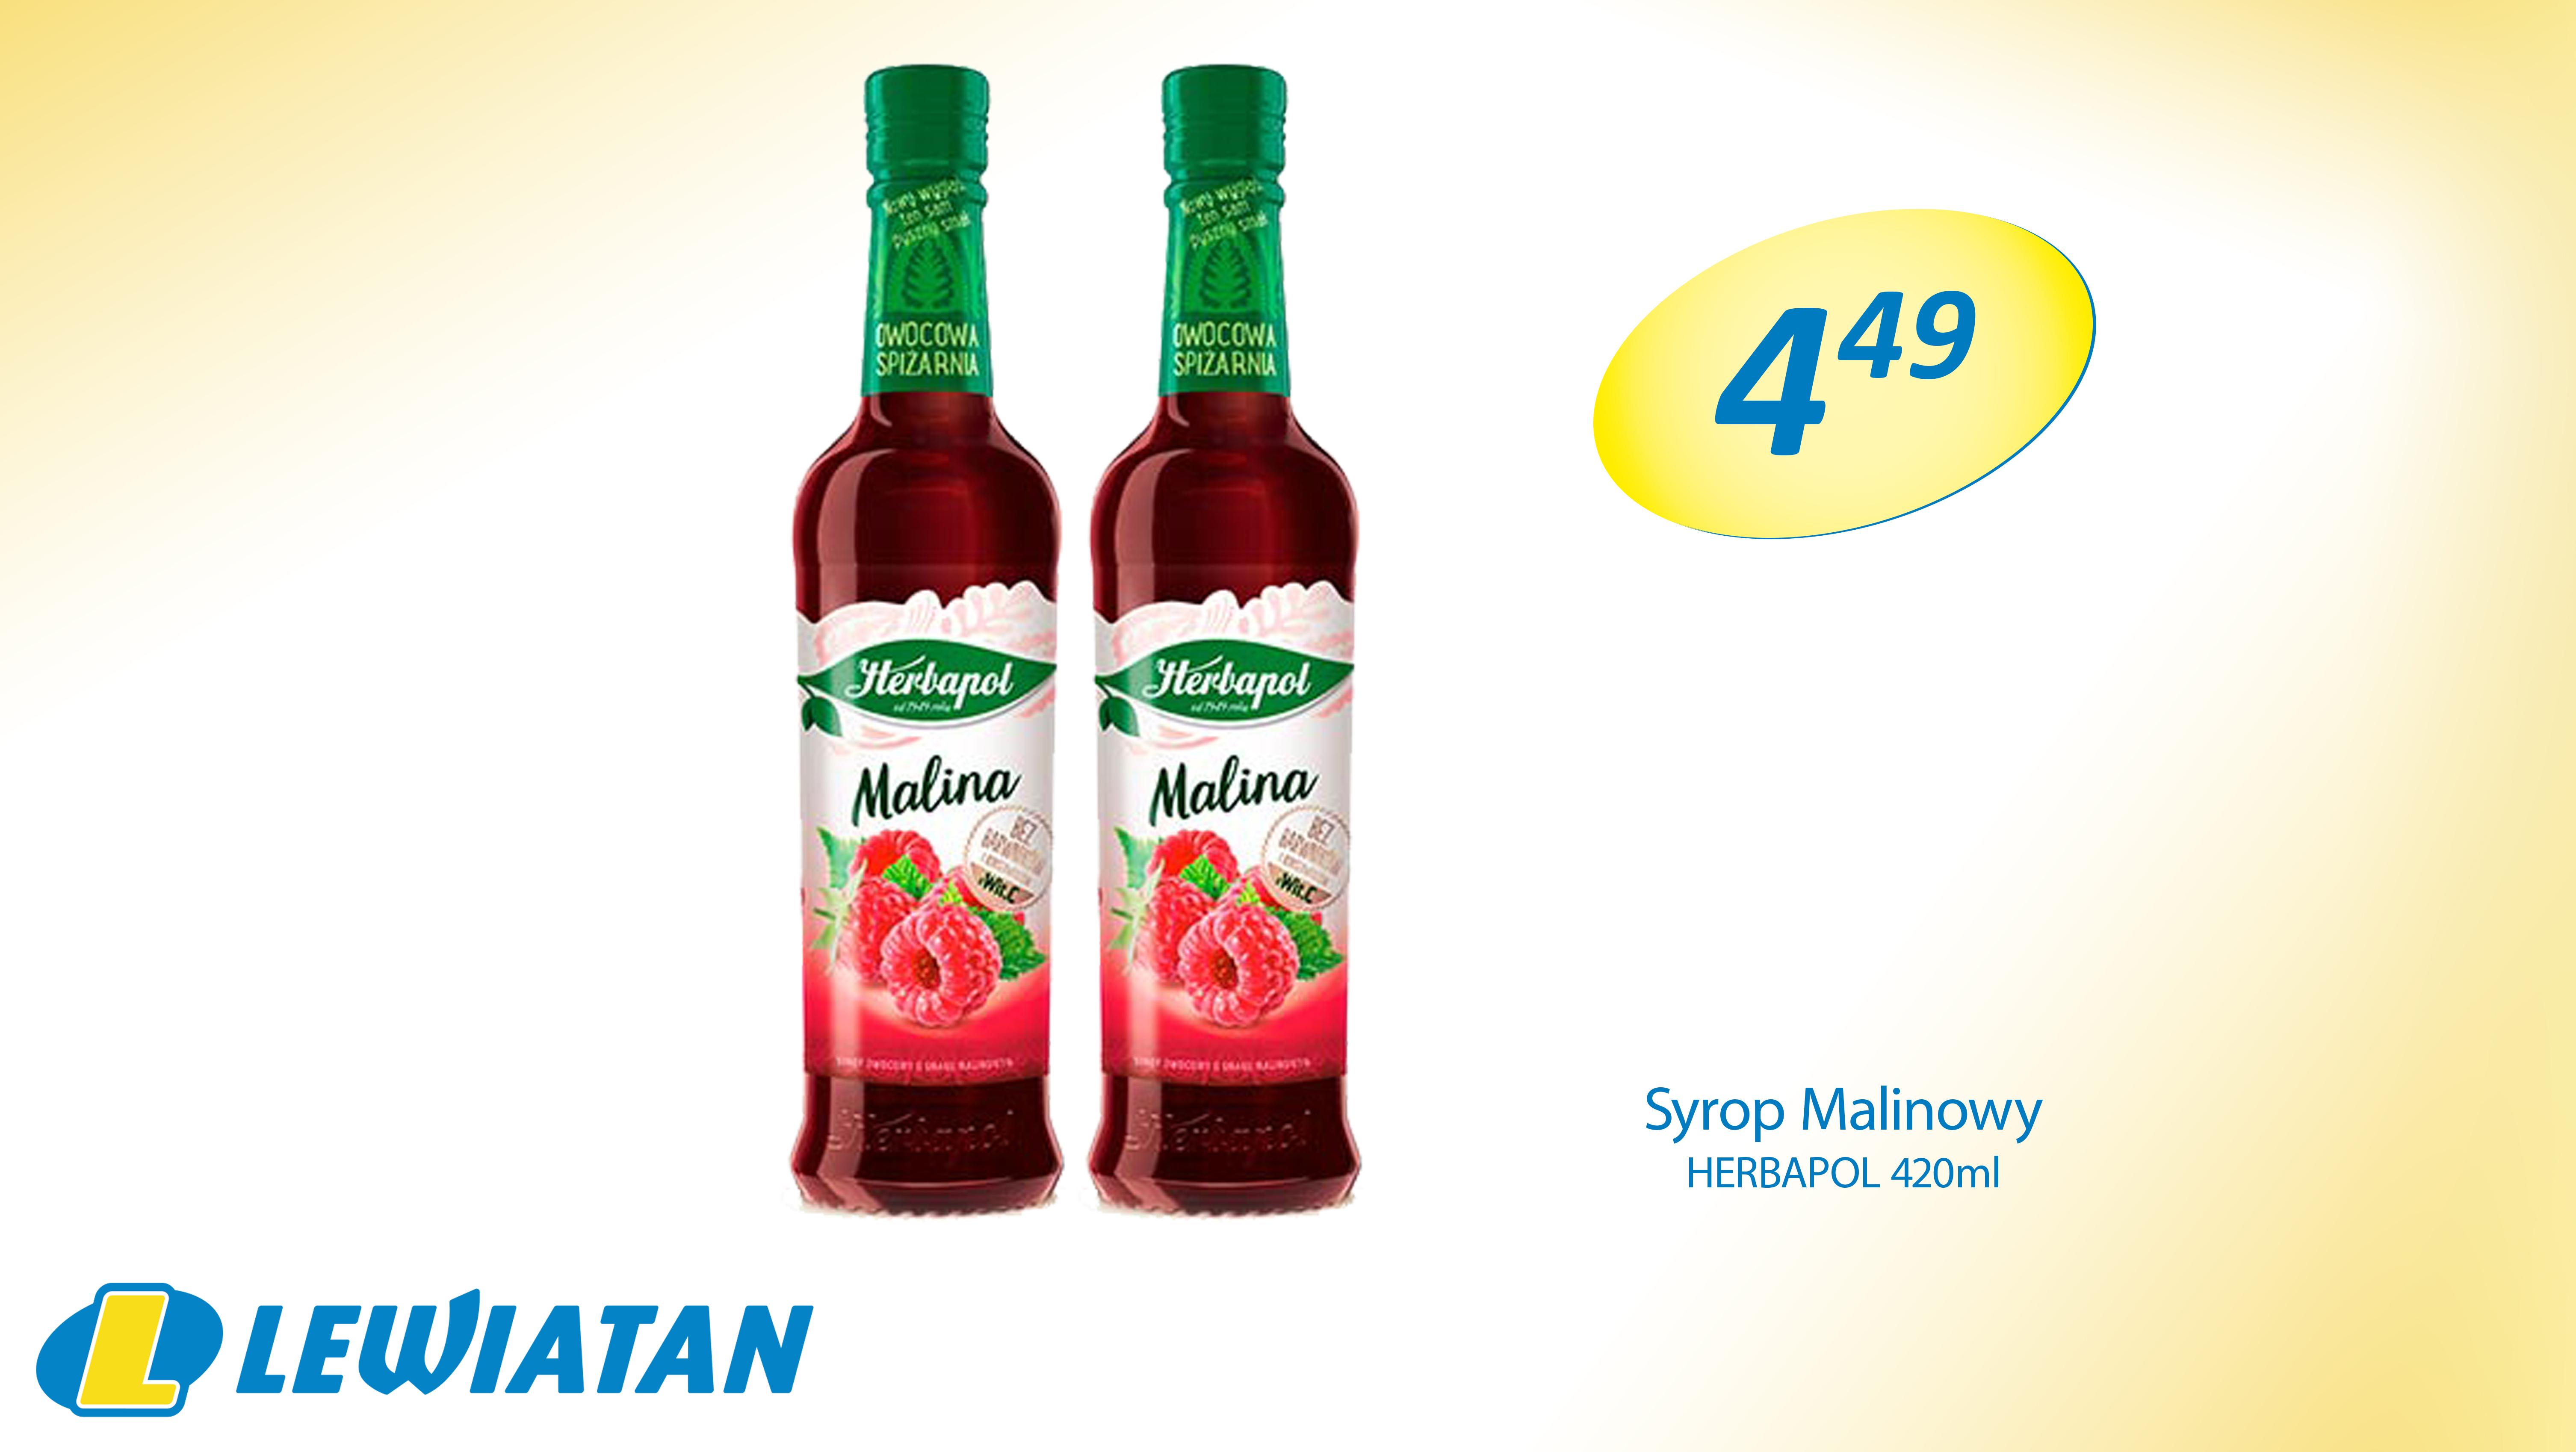 herbapol-syrop-malina-449